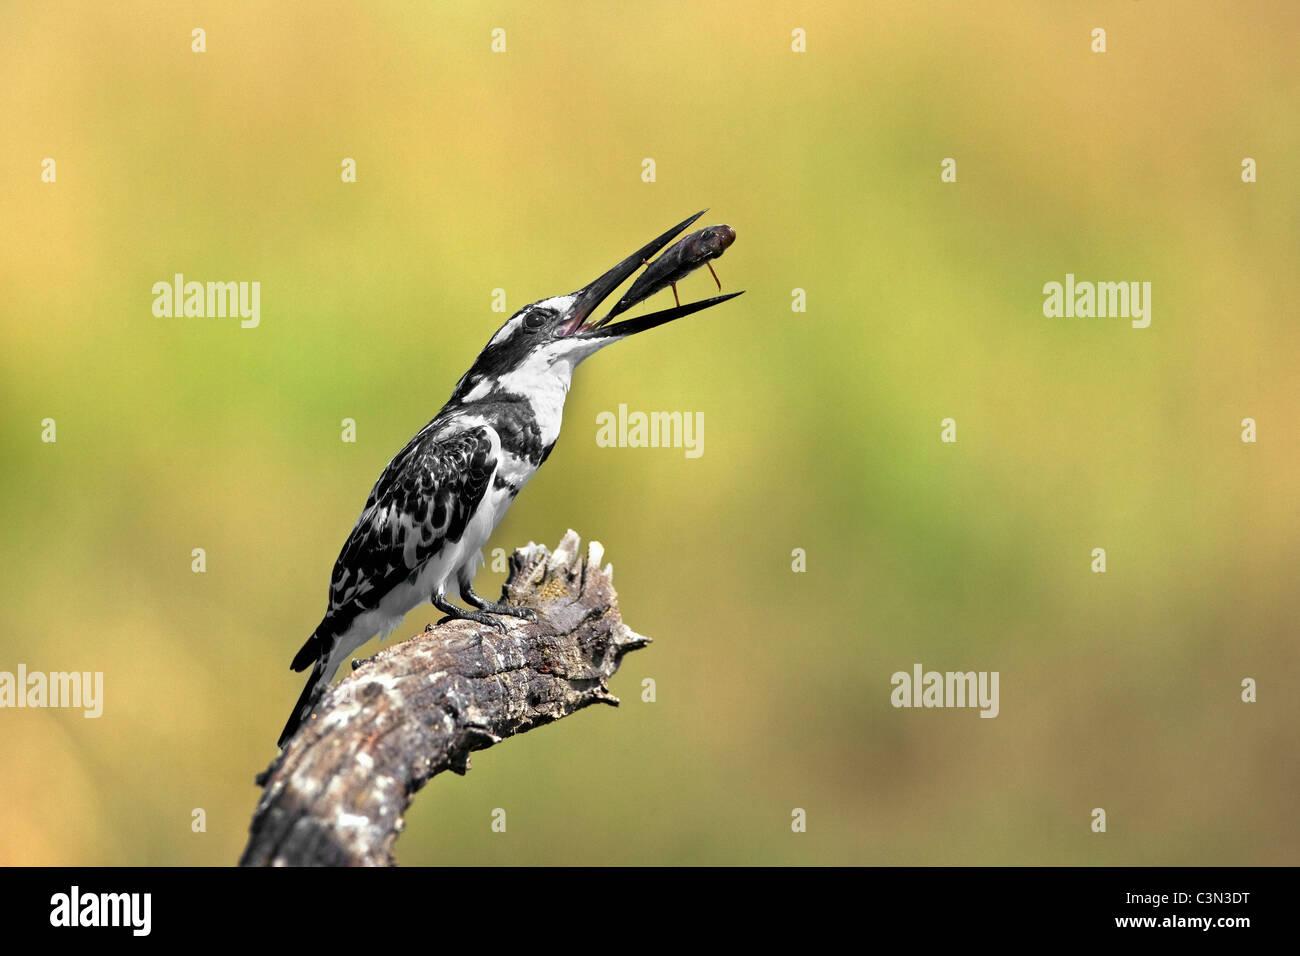 South Africa, near Rustenburg, Pilanesberg National Park. Mankwe Hide. Pied Kingfisher. (Ceryle rudis) with fish. - Stock Image